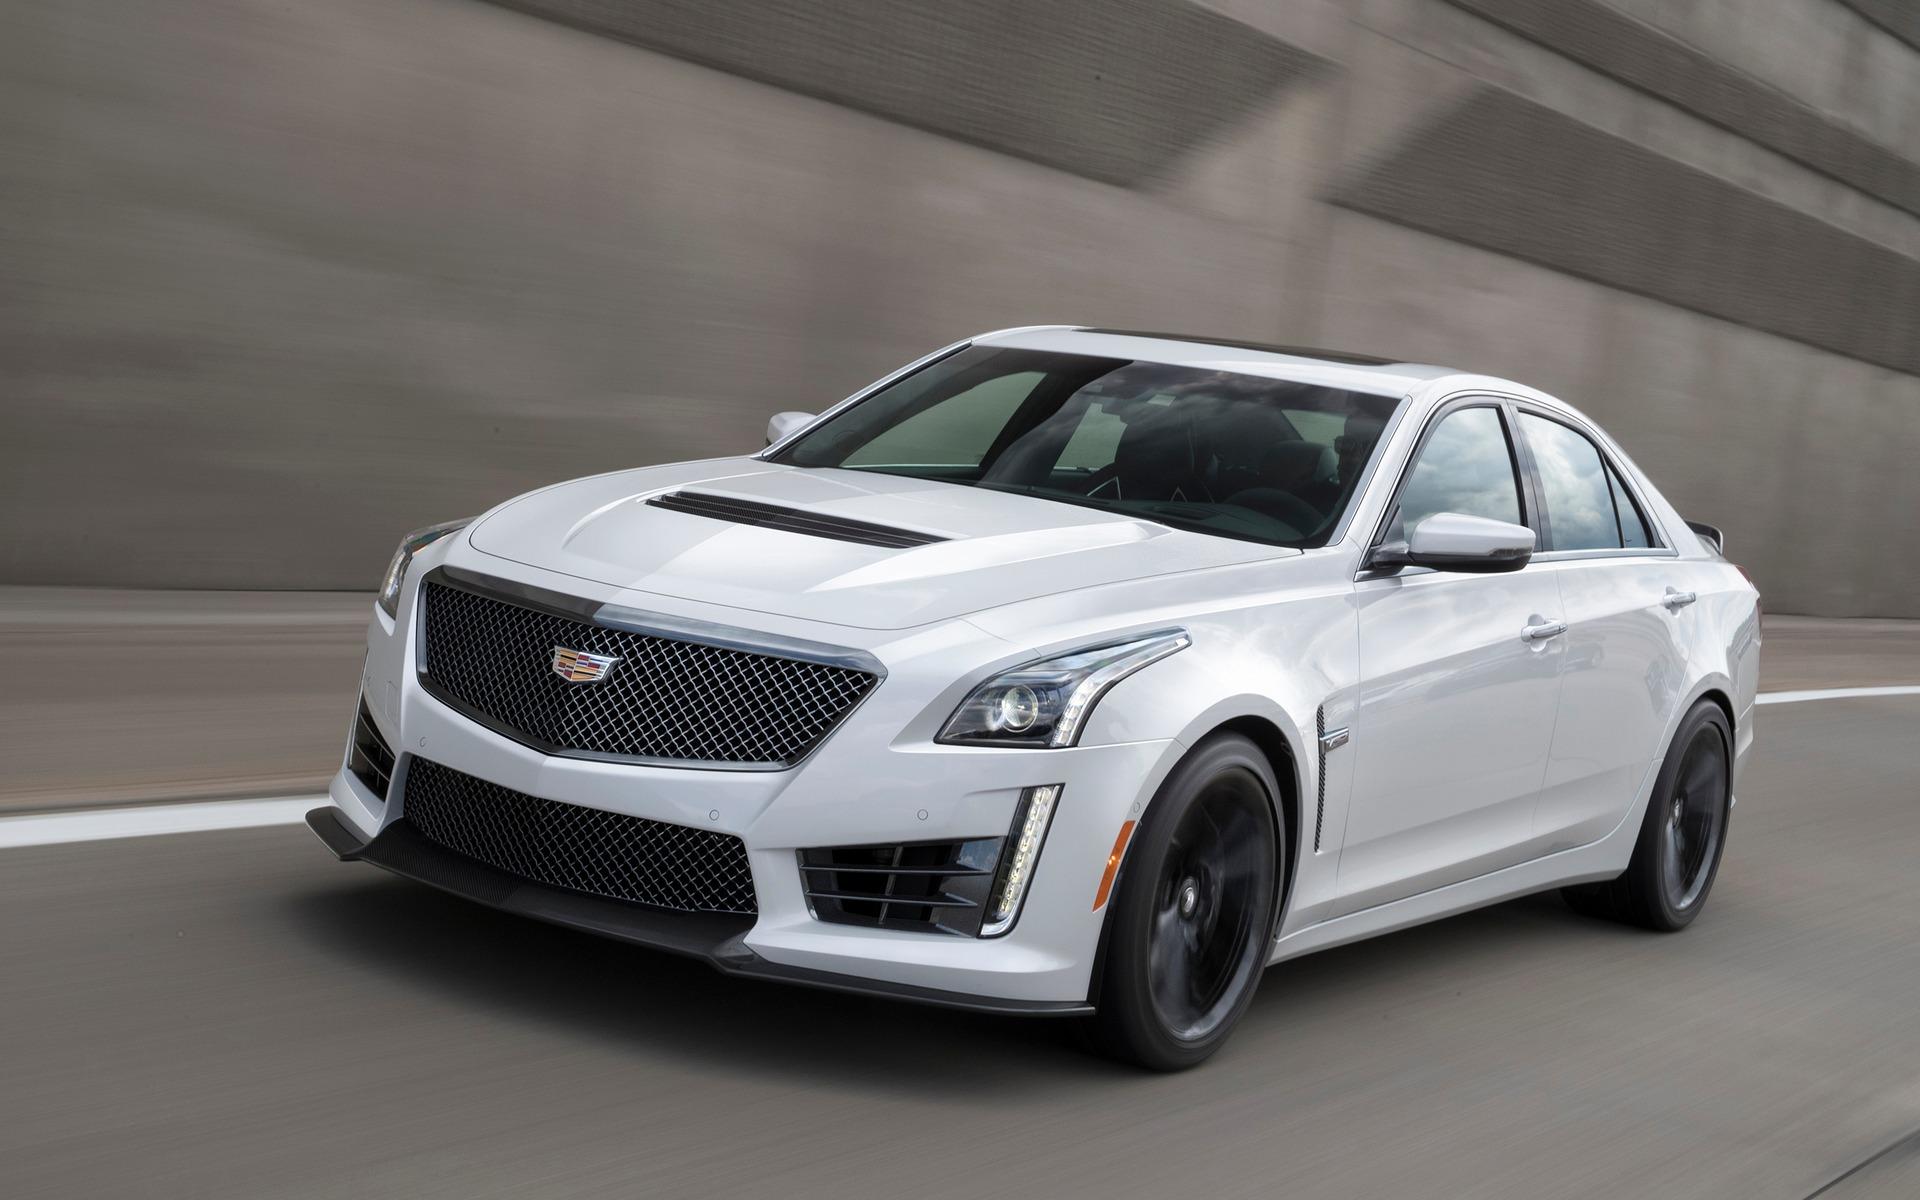 Cadillac CTS-V Carbon Black 2017